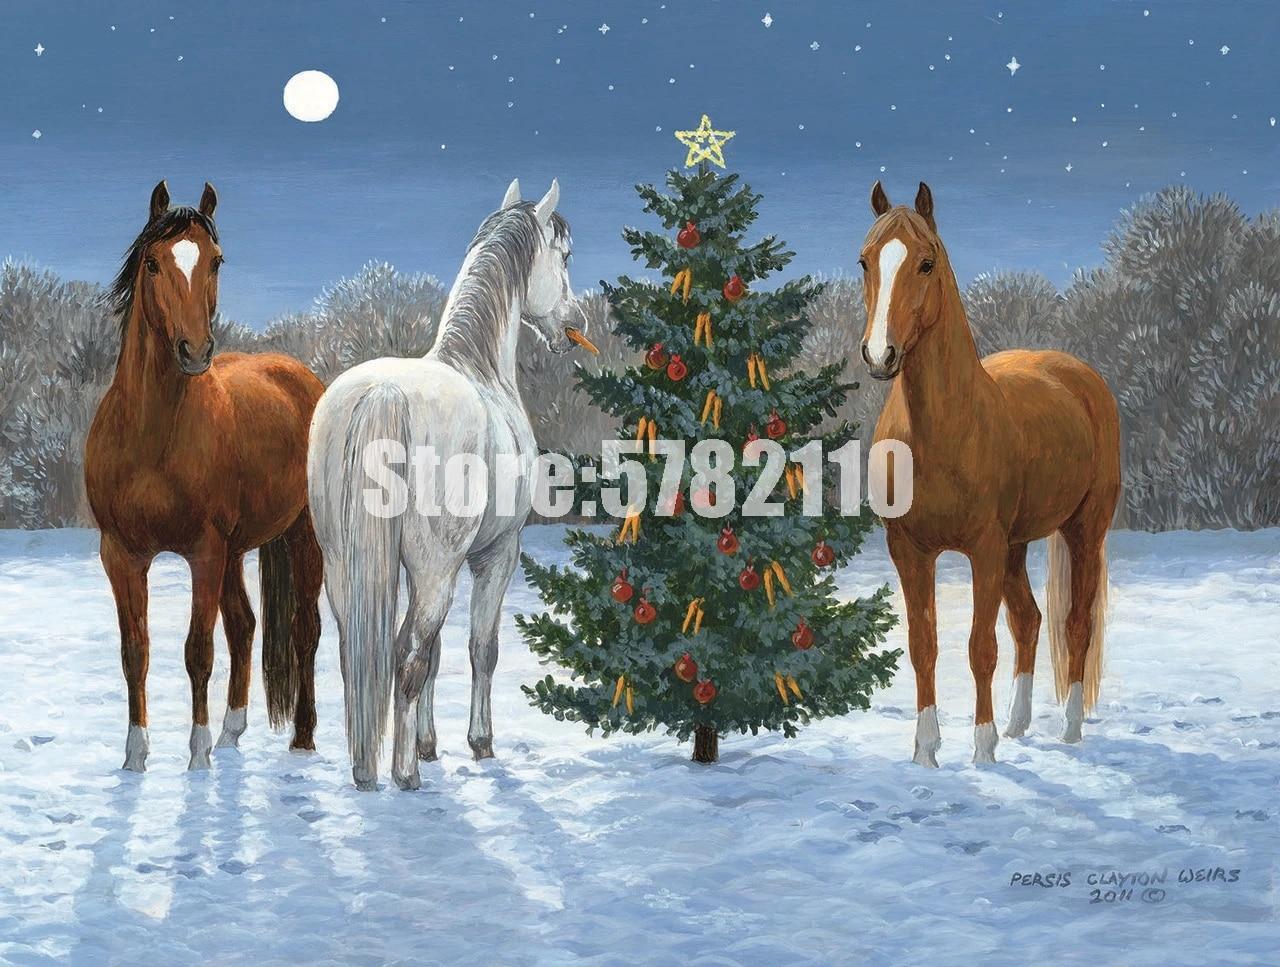 100 Full Diy 5d Diamond Painting Christmas Horses Winter Art Cross Stitch Diamond Embroidery Decoration Mosaic Home Decor Gifts Diamond Painting Cross Stitch Aliexpress